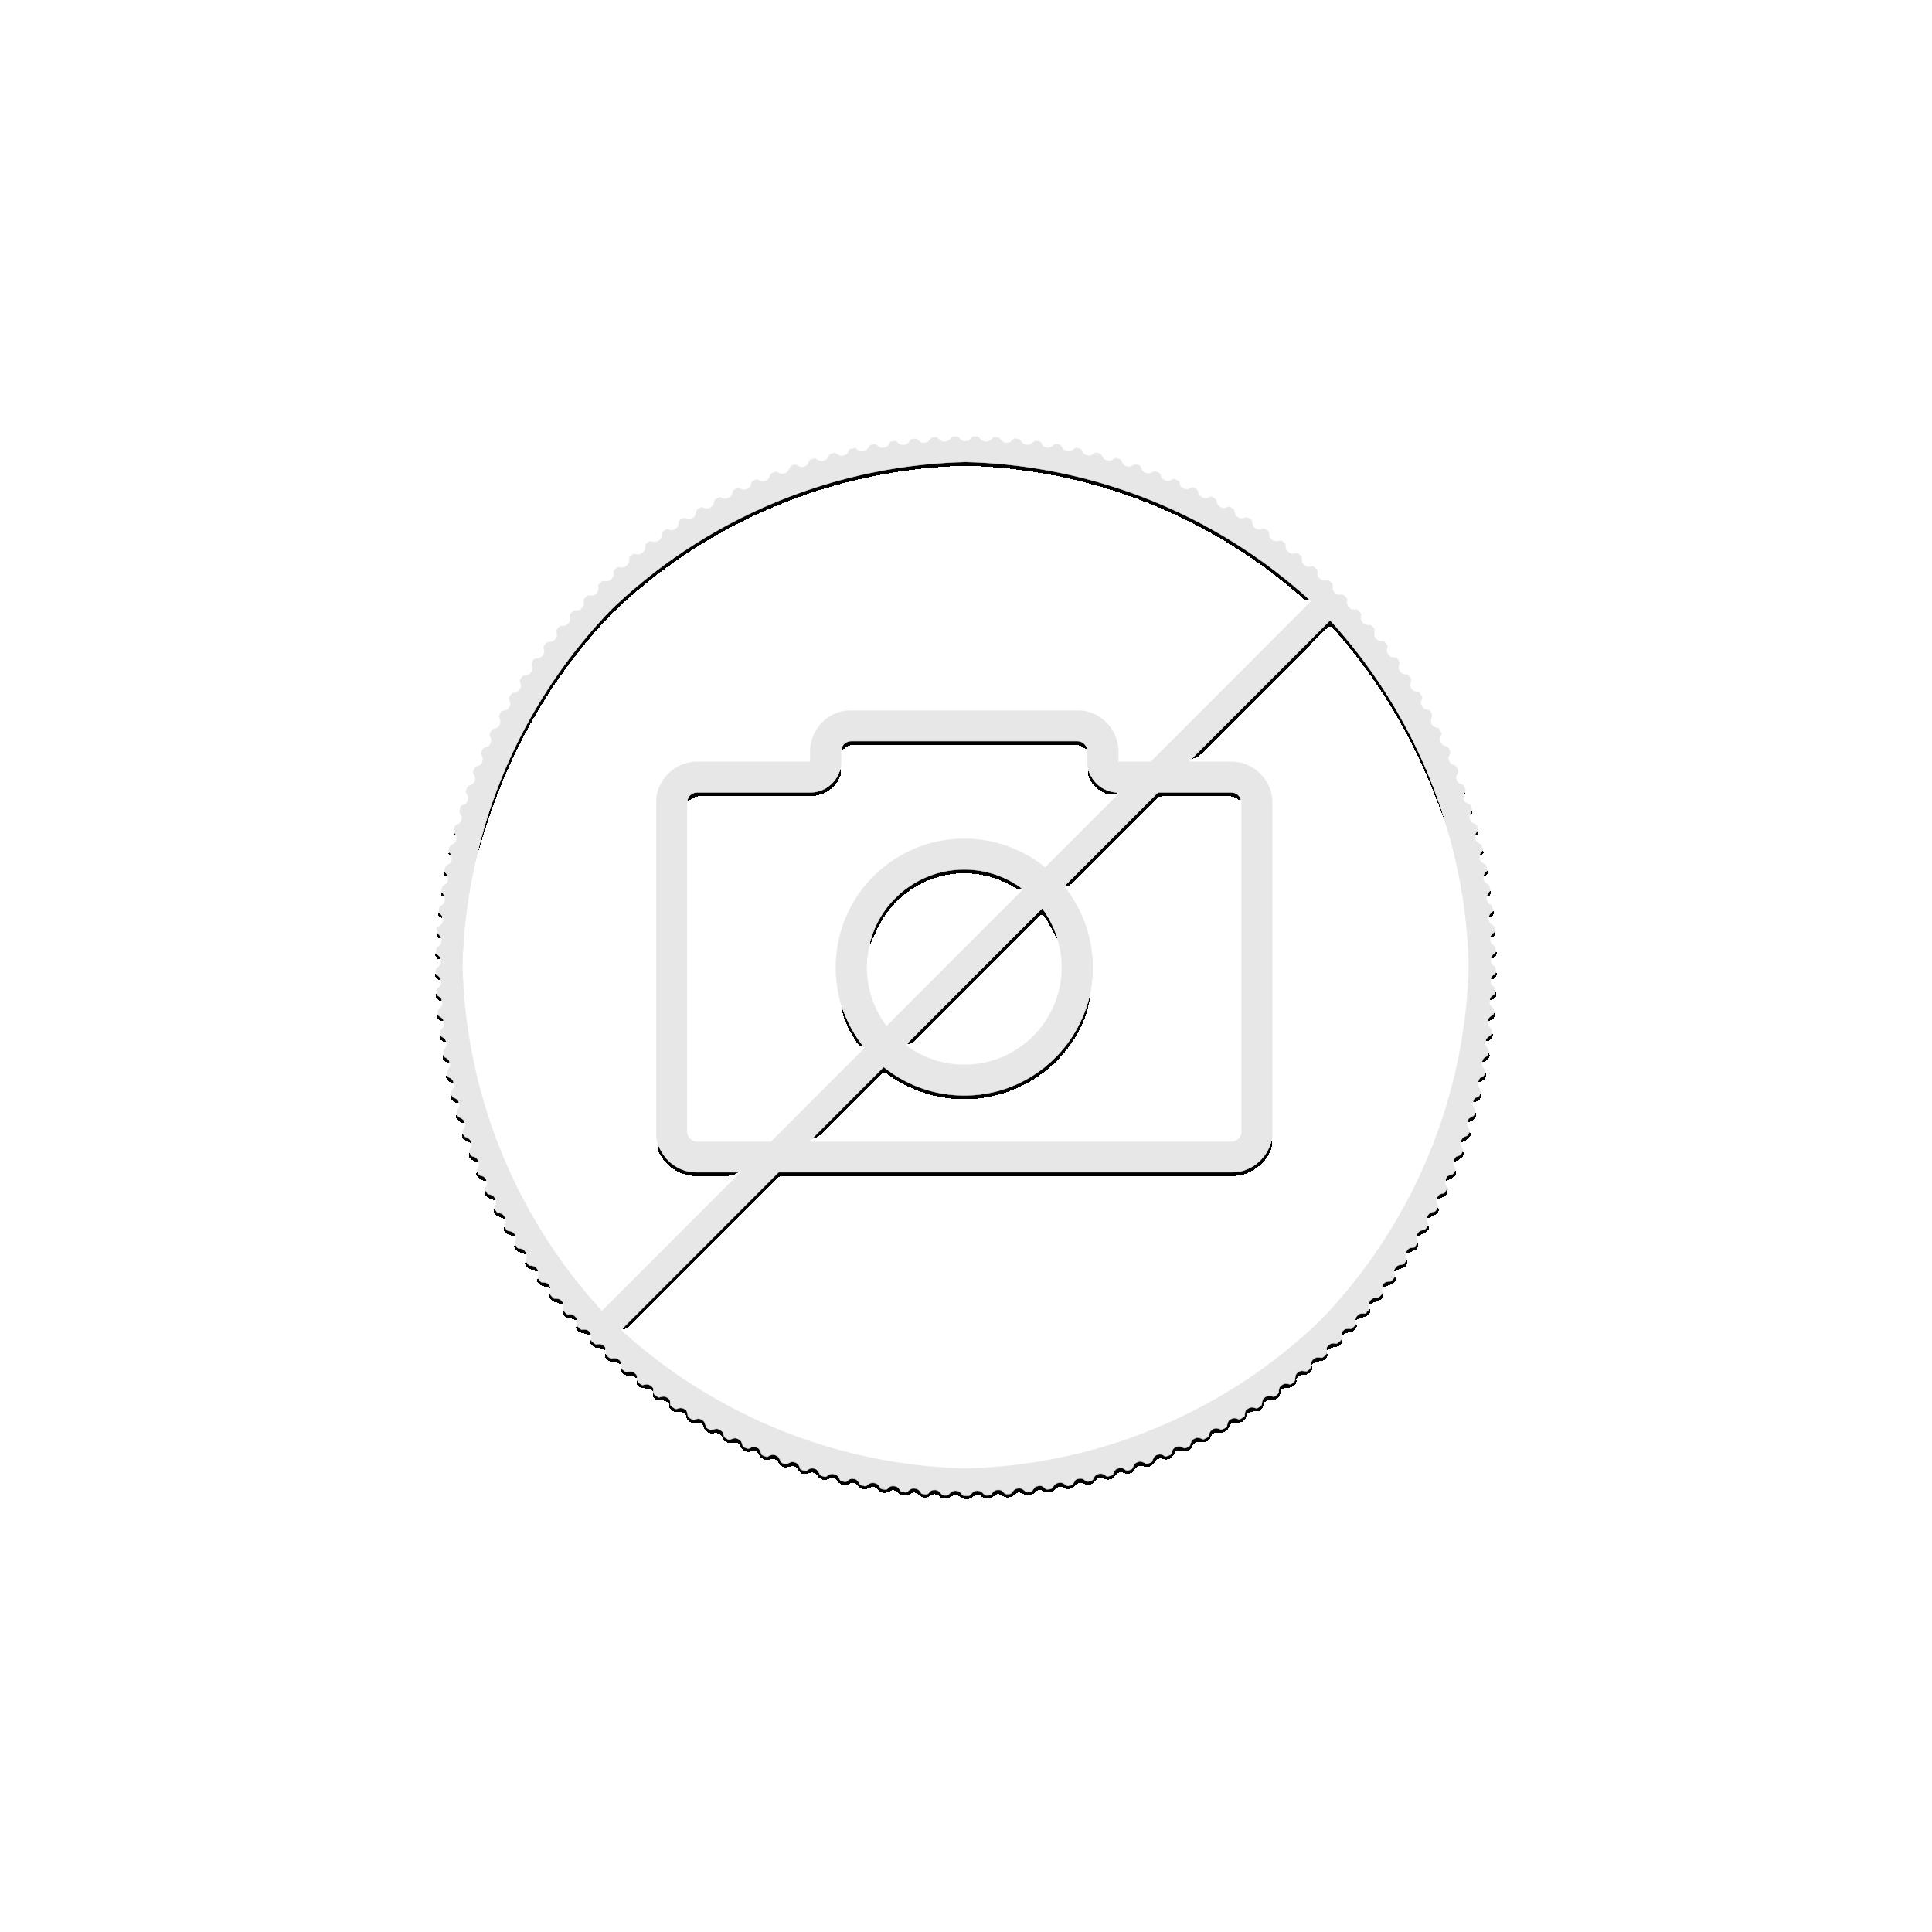 1/4 troy ounce gold Philharmonic coin 2020